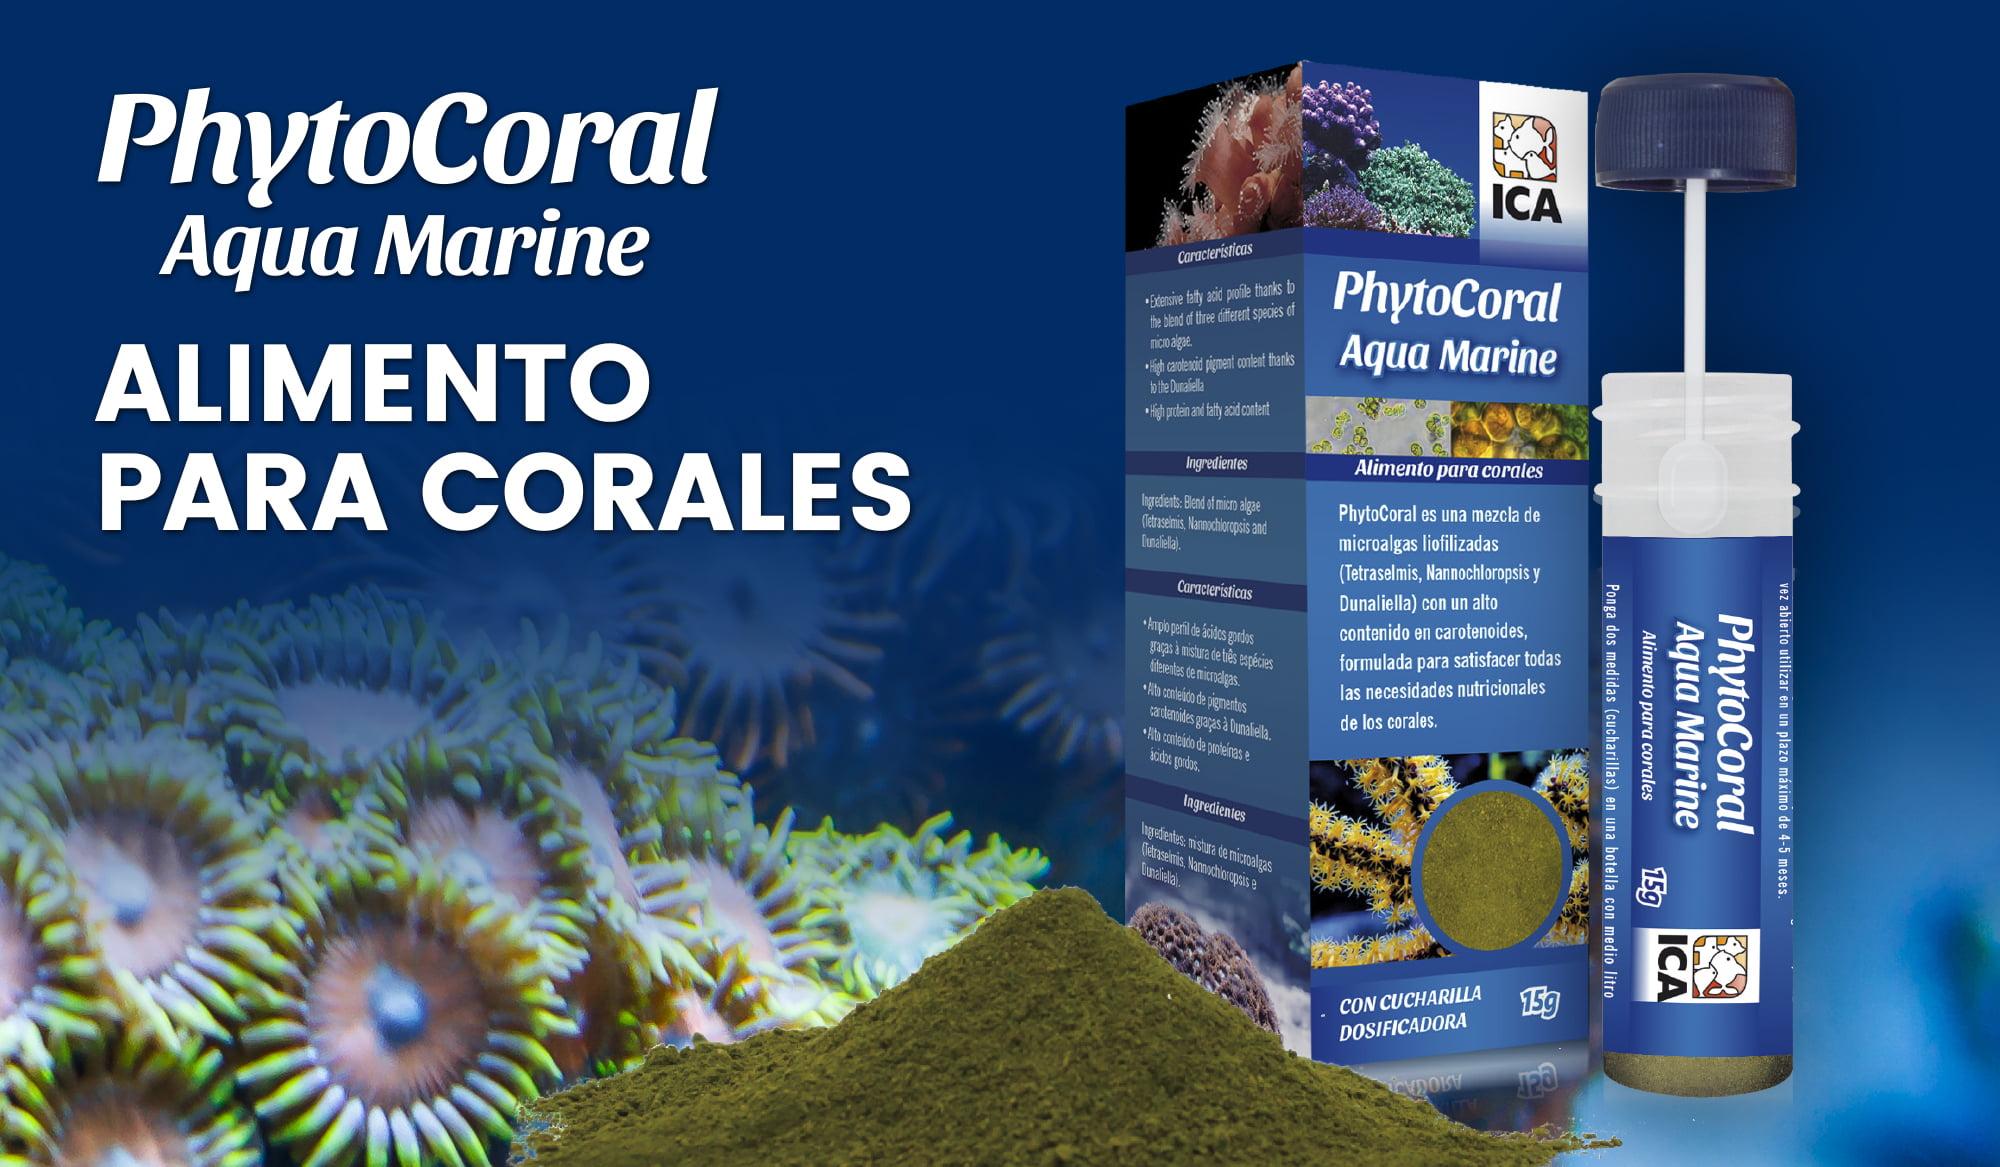 PhytoCoral: alimento para corales